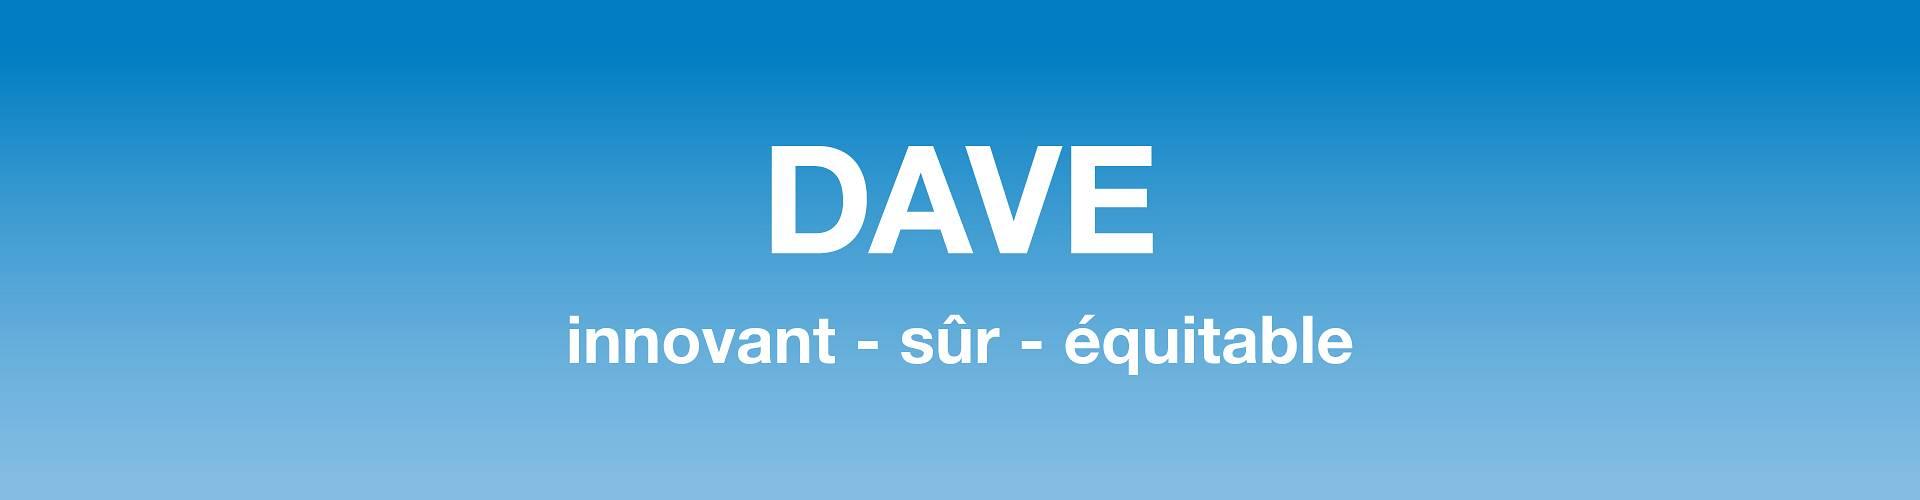 DAVE - innovant - sûr - équitable RE/MAX